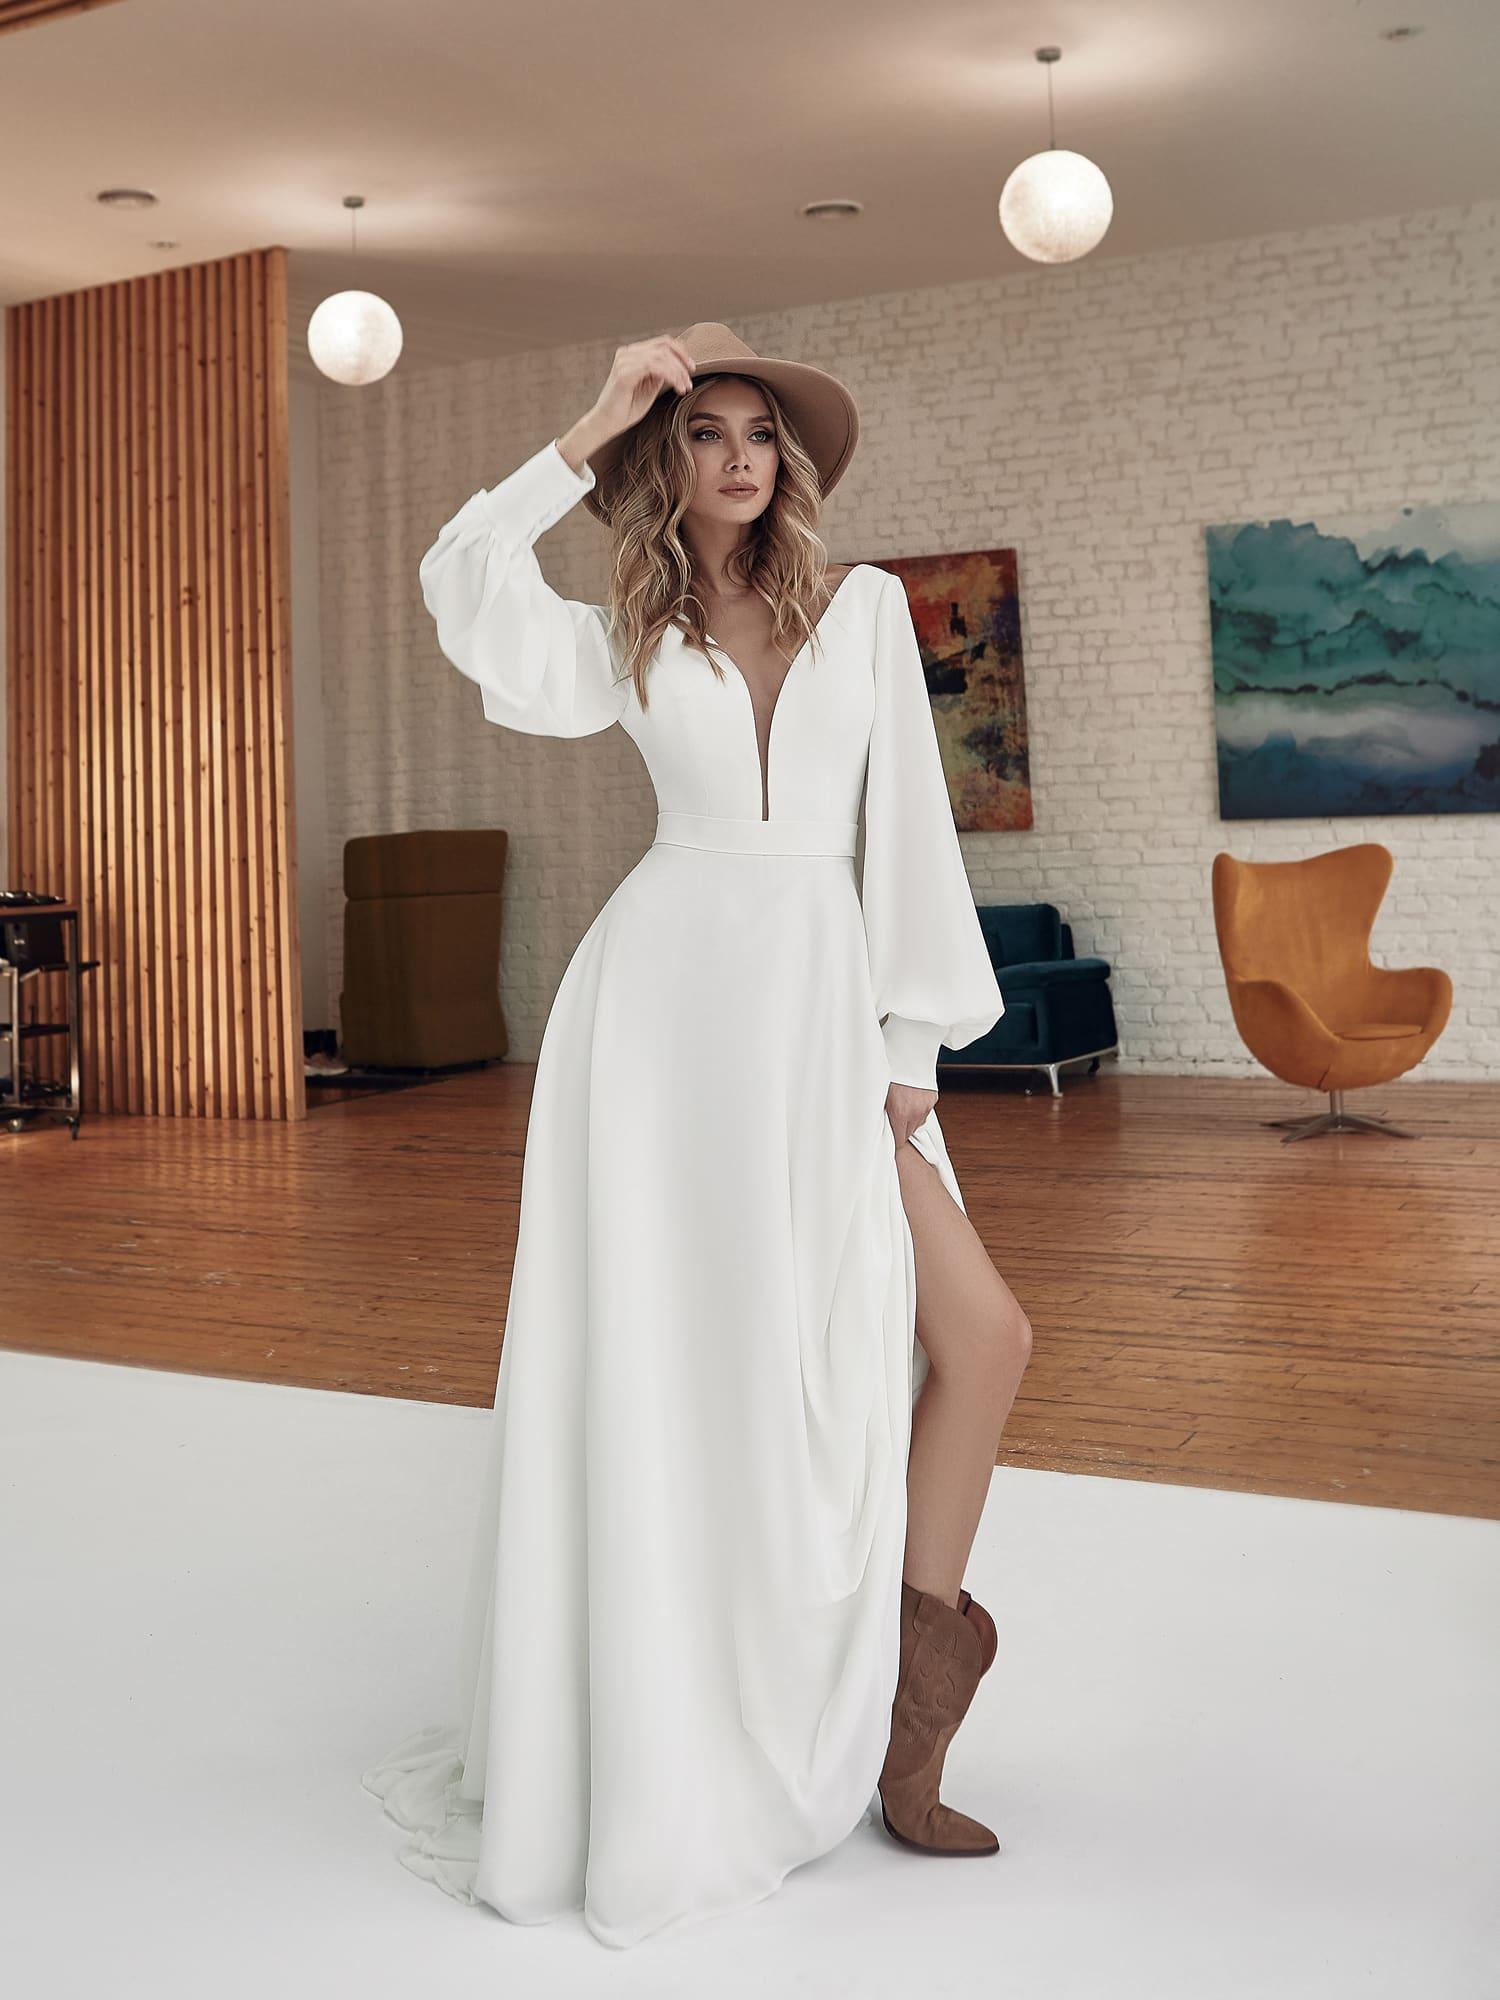 Свадебное платье Lima, производитель natalia-romanova, https://bliss.by